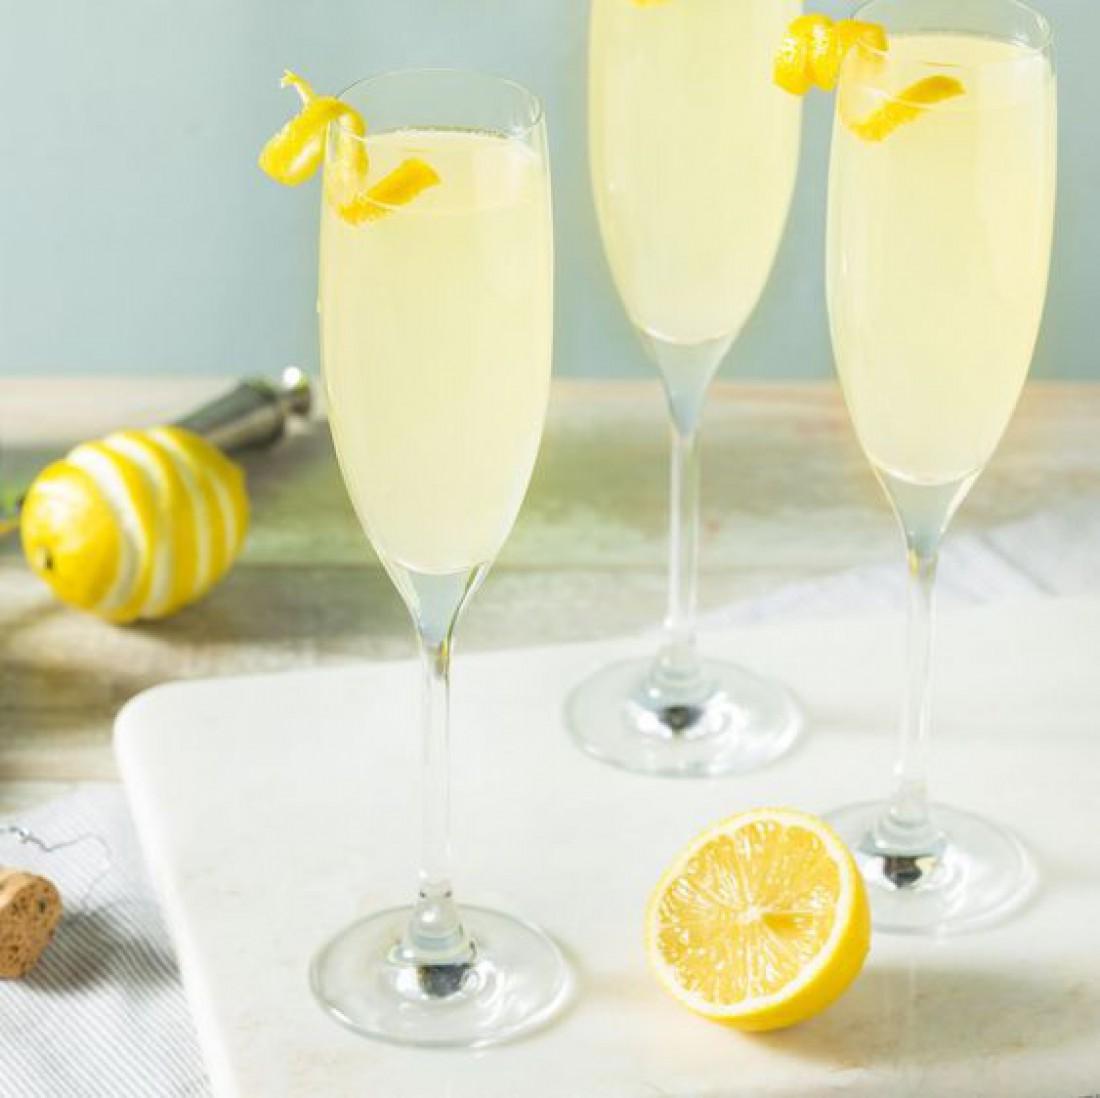 Фрэнч 75: рецепт коктейля